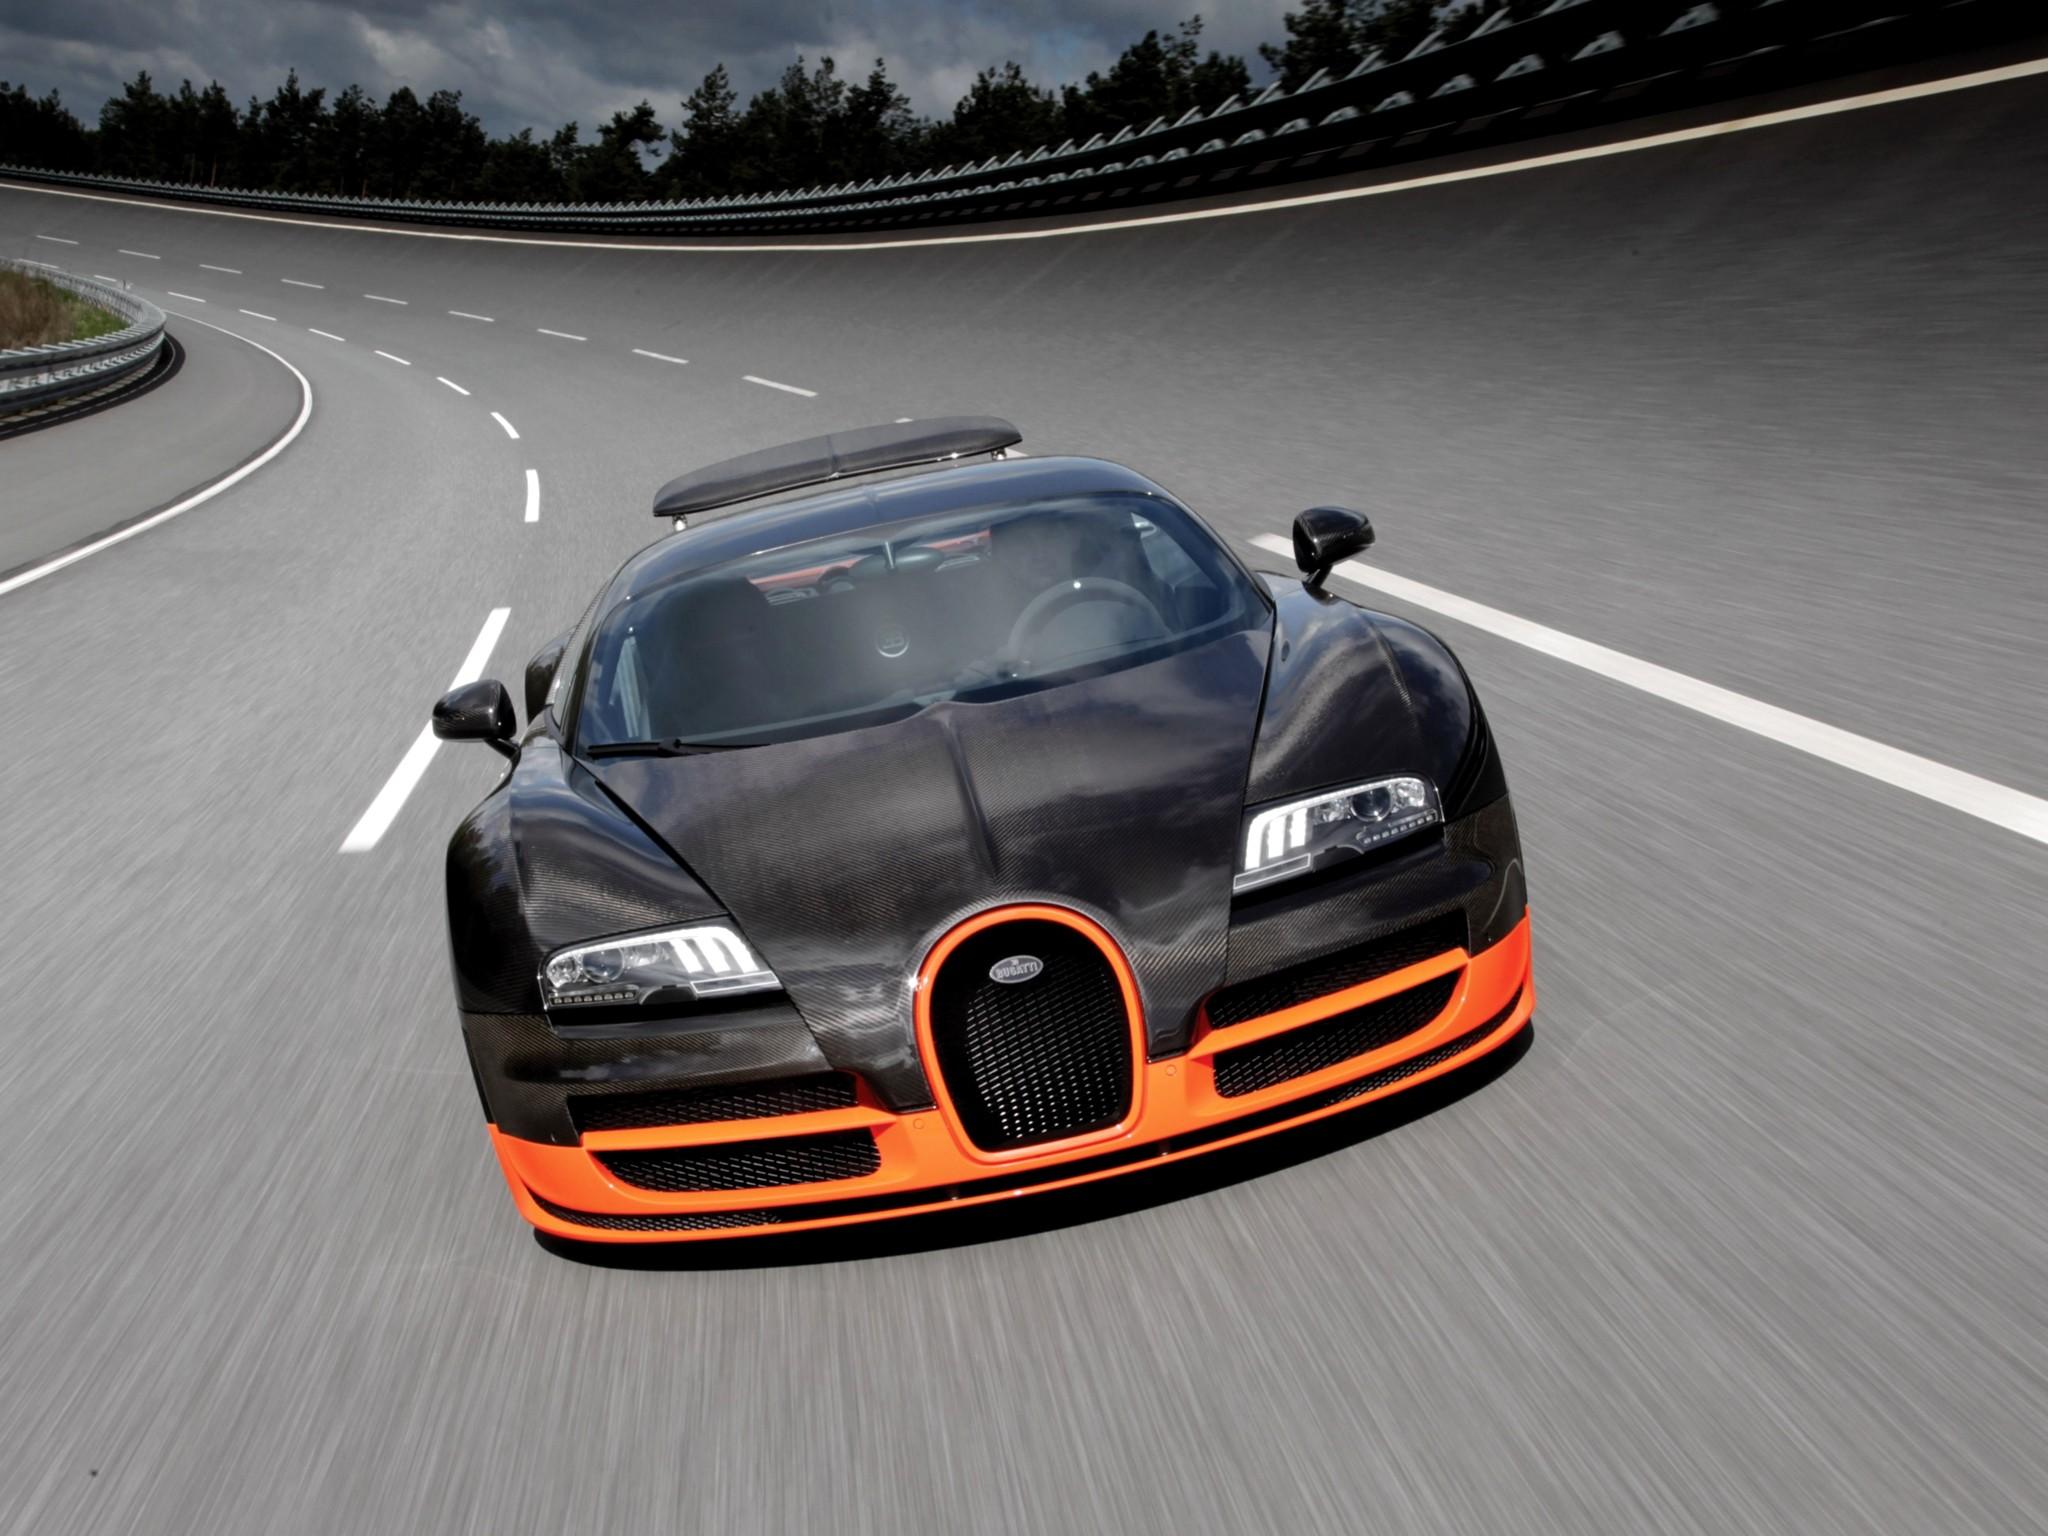 bugatti veyron super sport specs 2010 2011 autoevolution. Black Bedroom Furniture Sets. Home Design Ideas